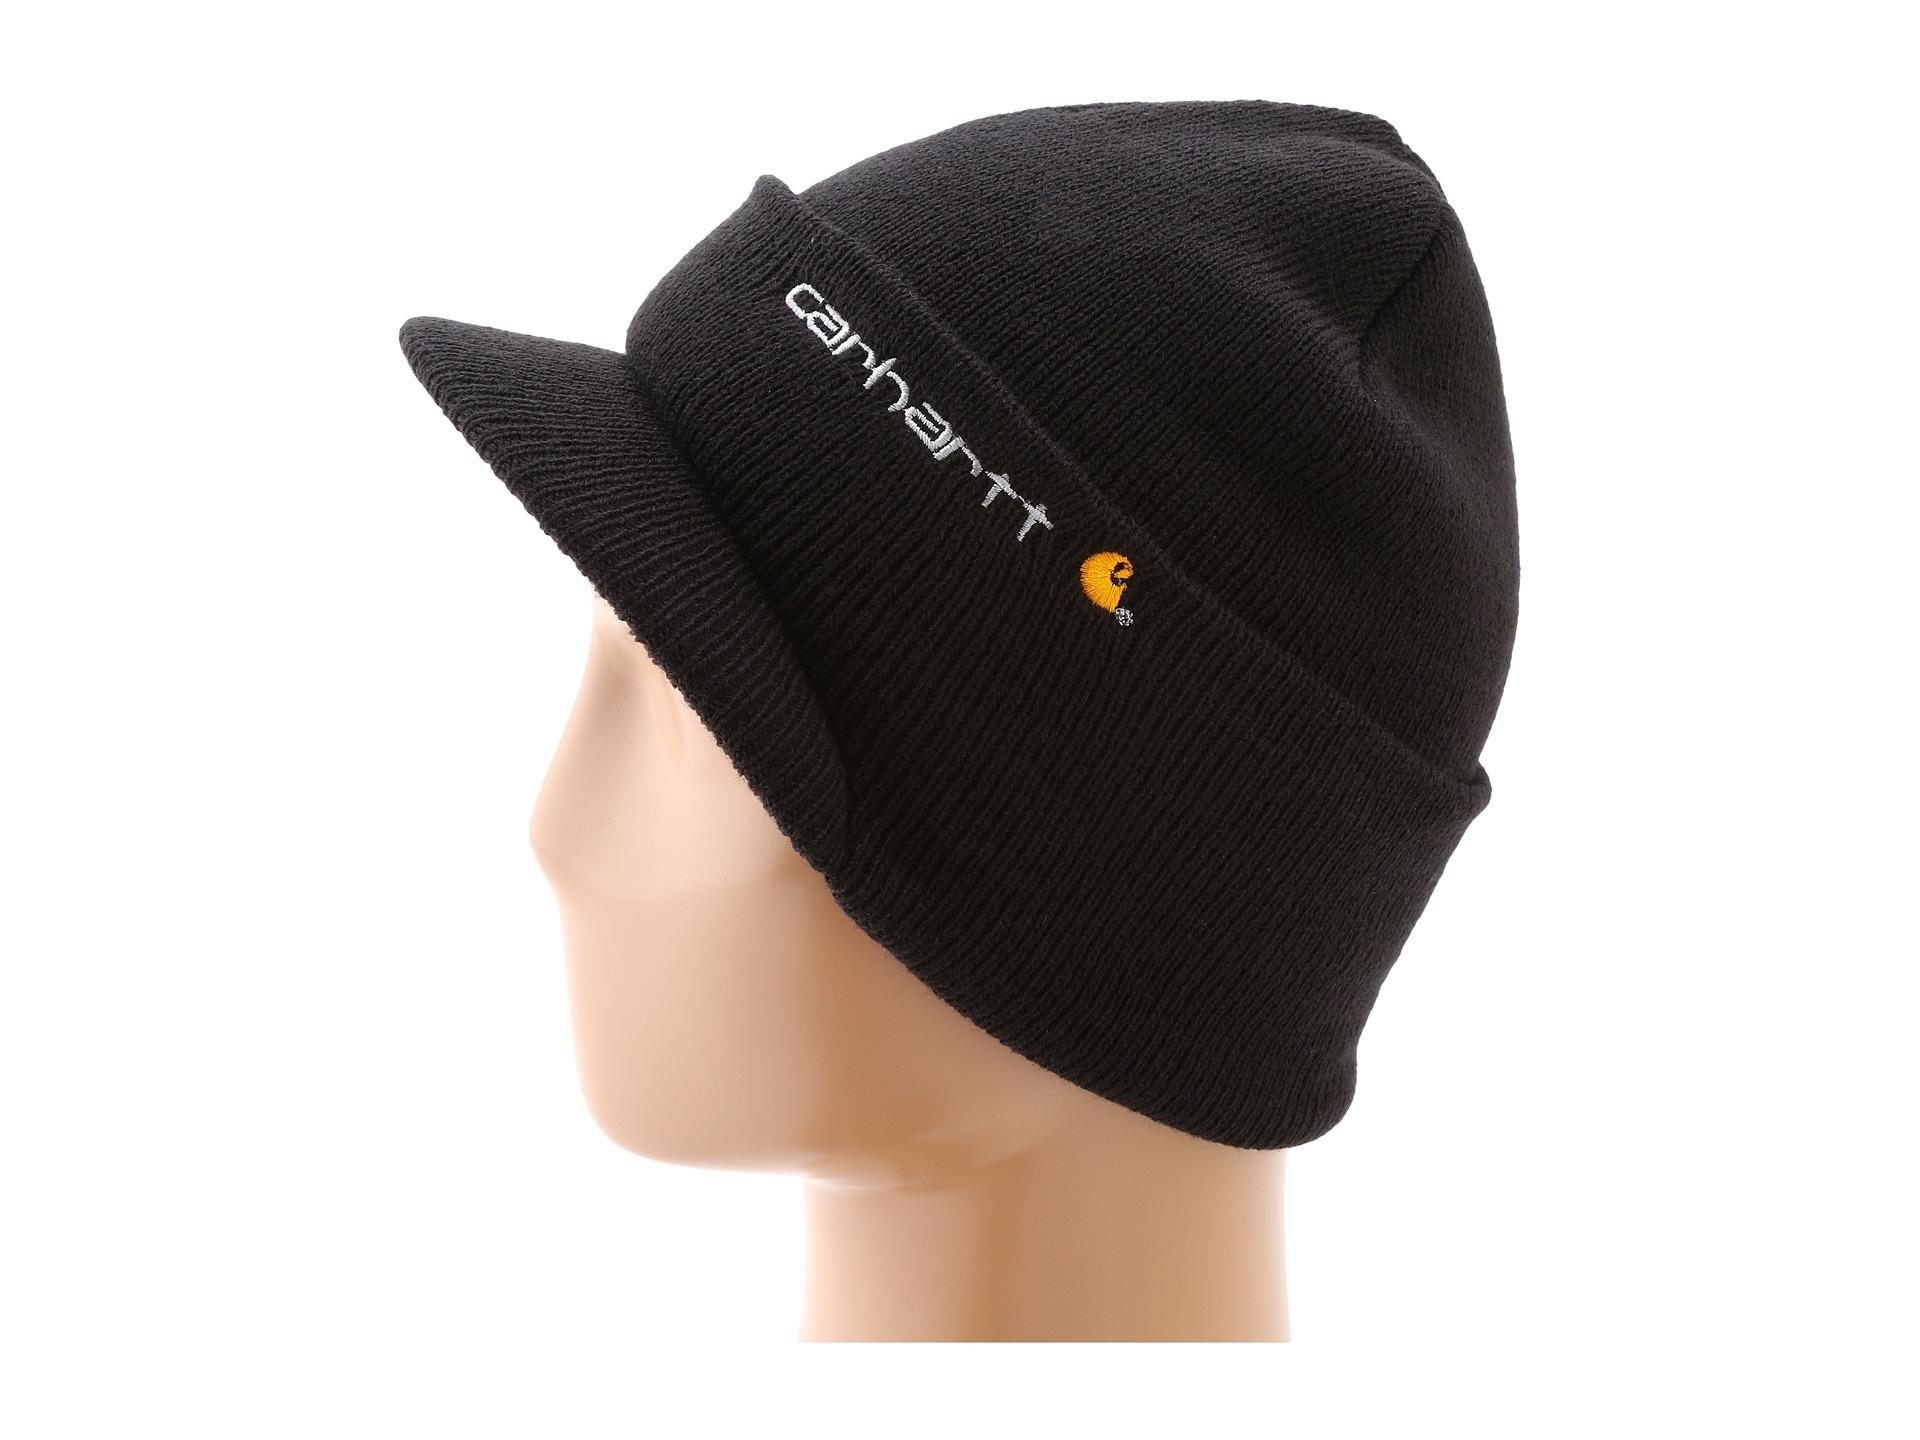 Lyst - Carhartt Knit Hat With Visor in Black for Men 19d39969d42